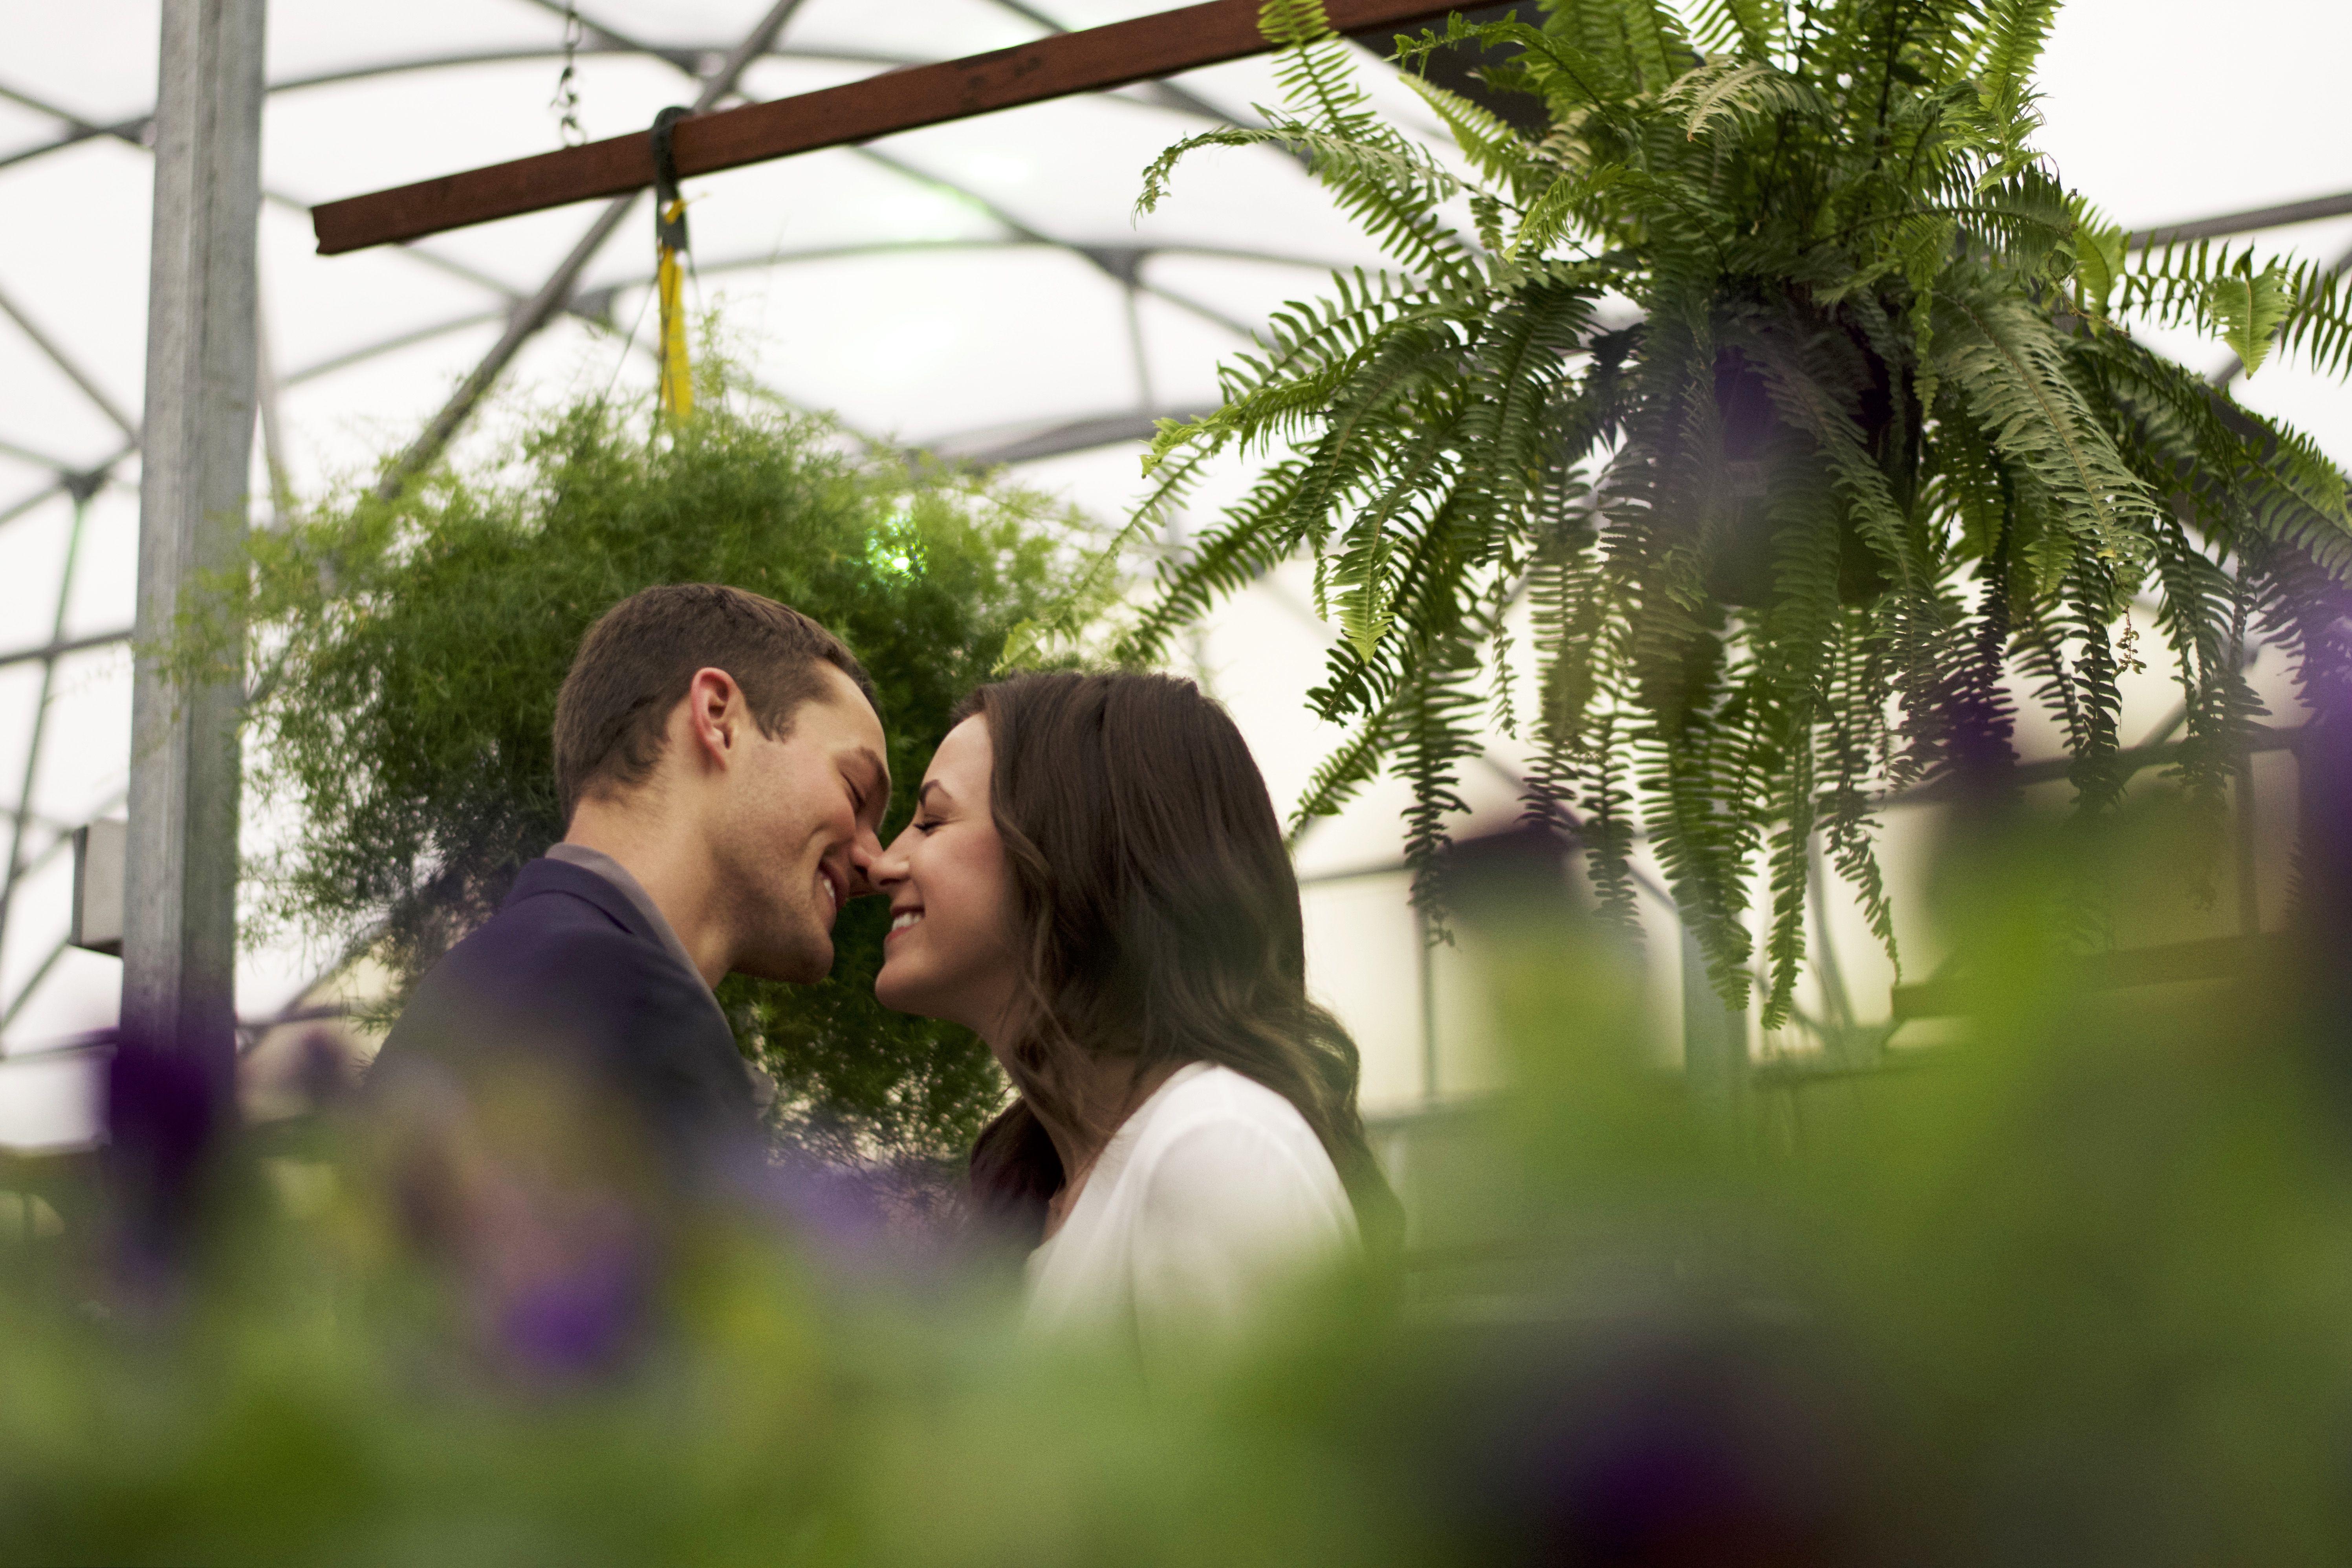 The greenhouse dallas tx - Greenhouse Engagement Photos Dallas Texas Wedding Photographer Camera Shi Photography